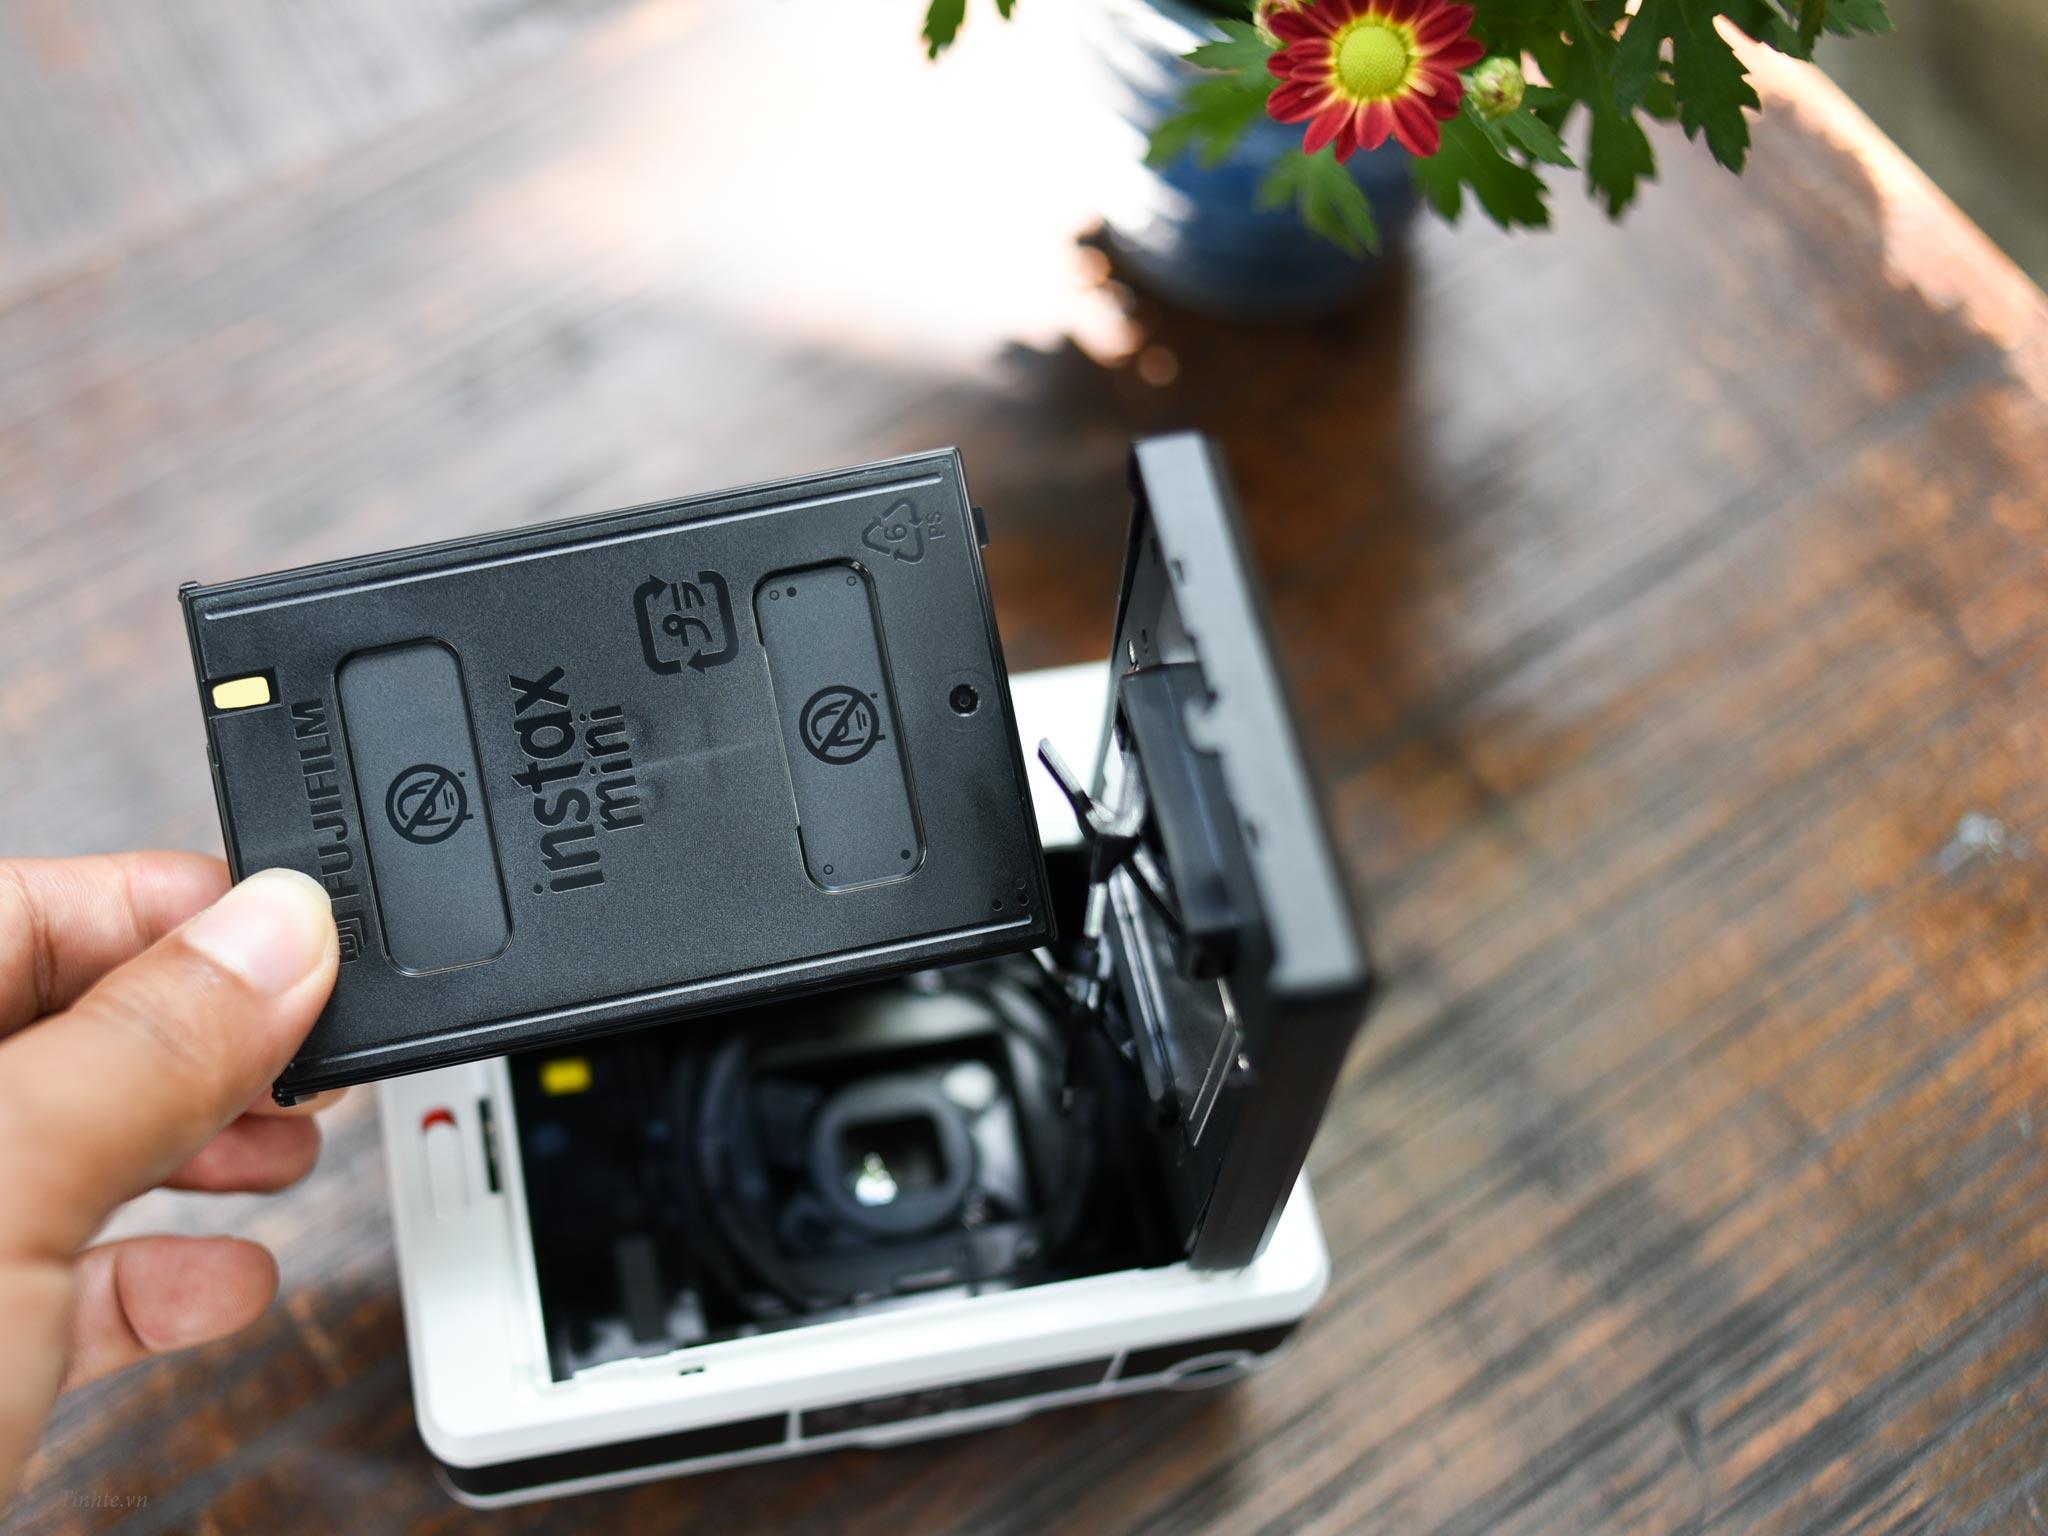 Leica_Sofort_camera.tinhte.vn_03.jpg